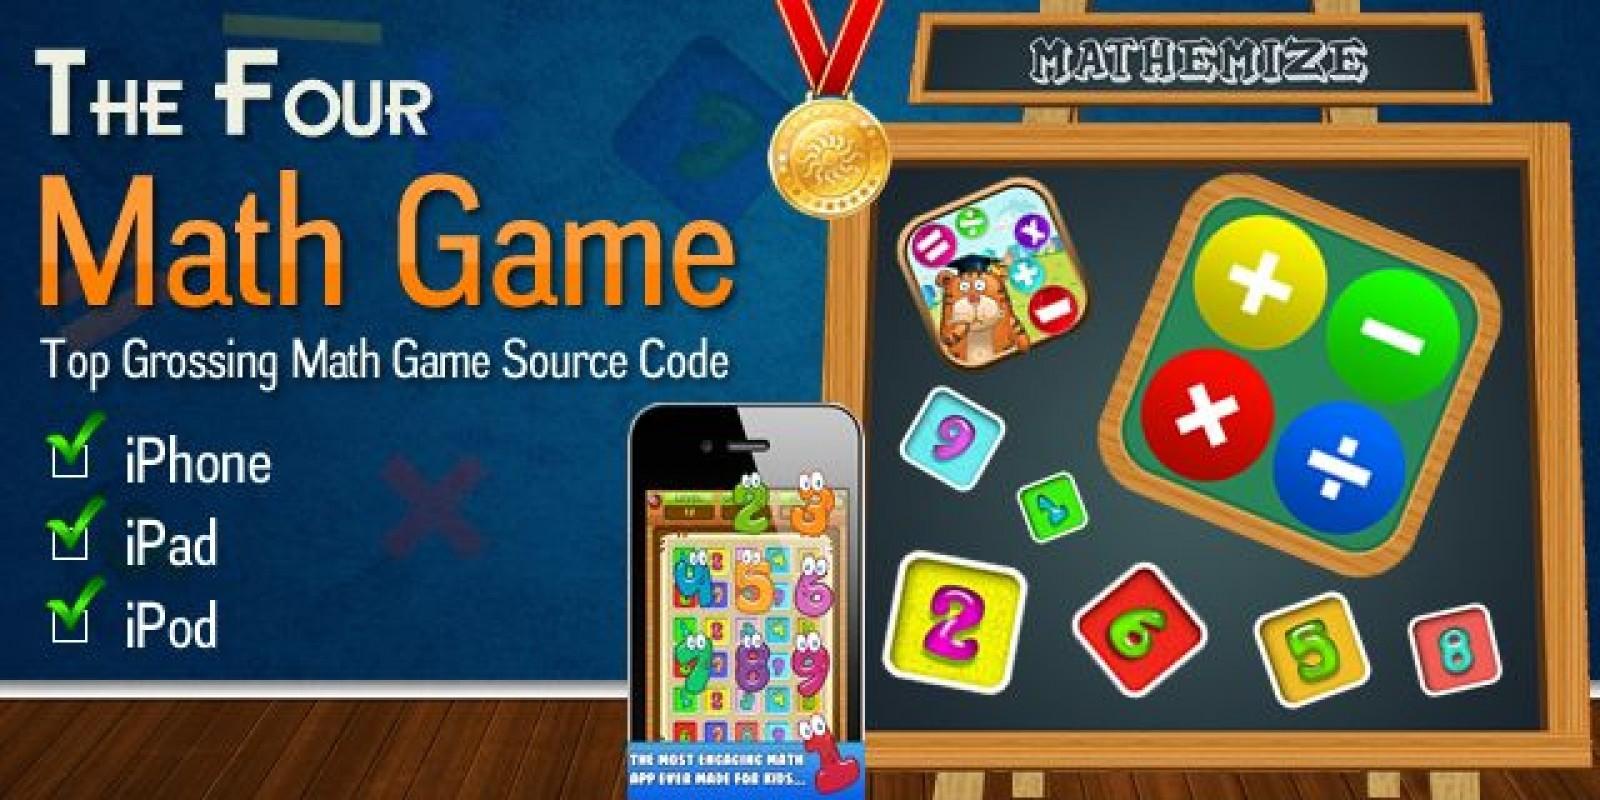 The Four Math Game iOS Source Code